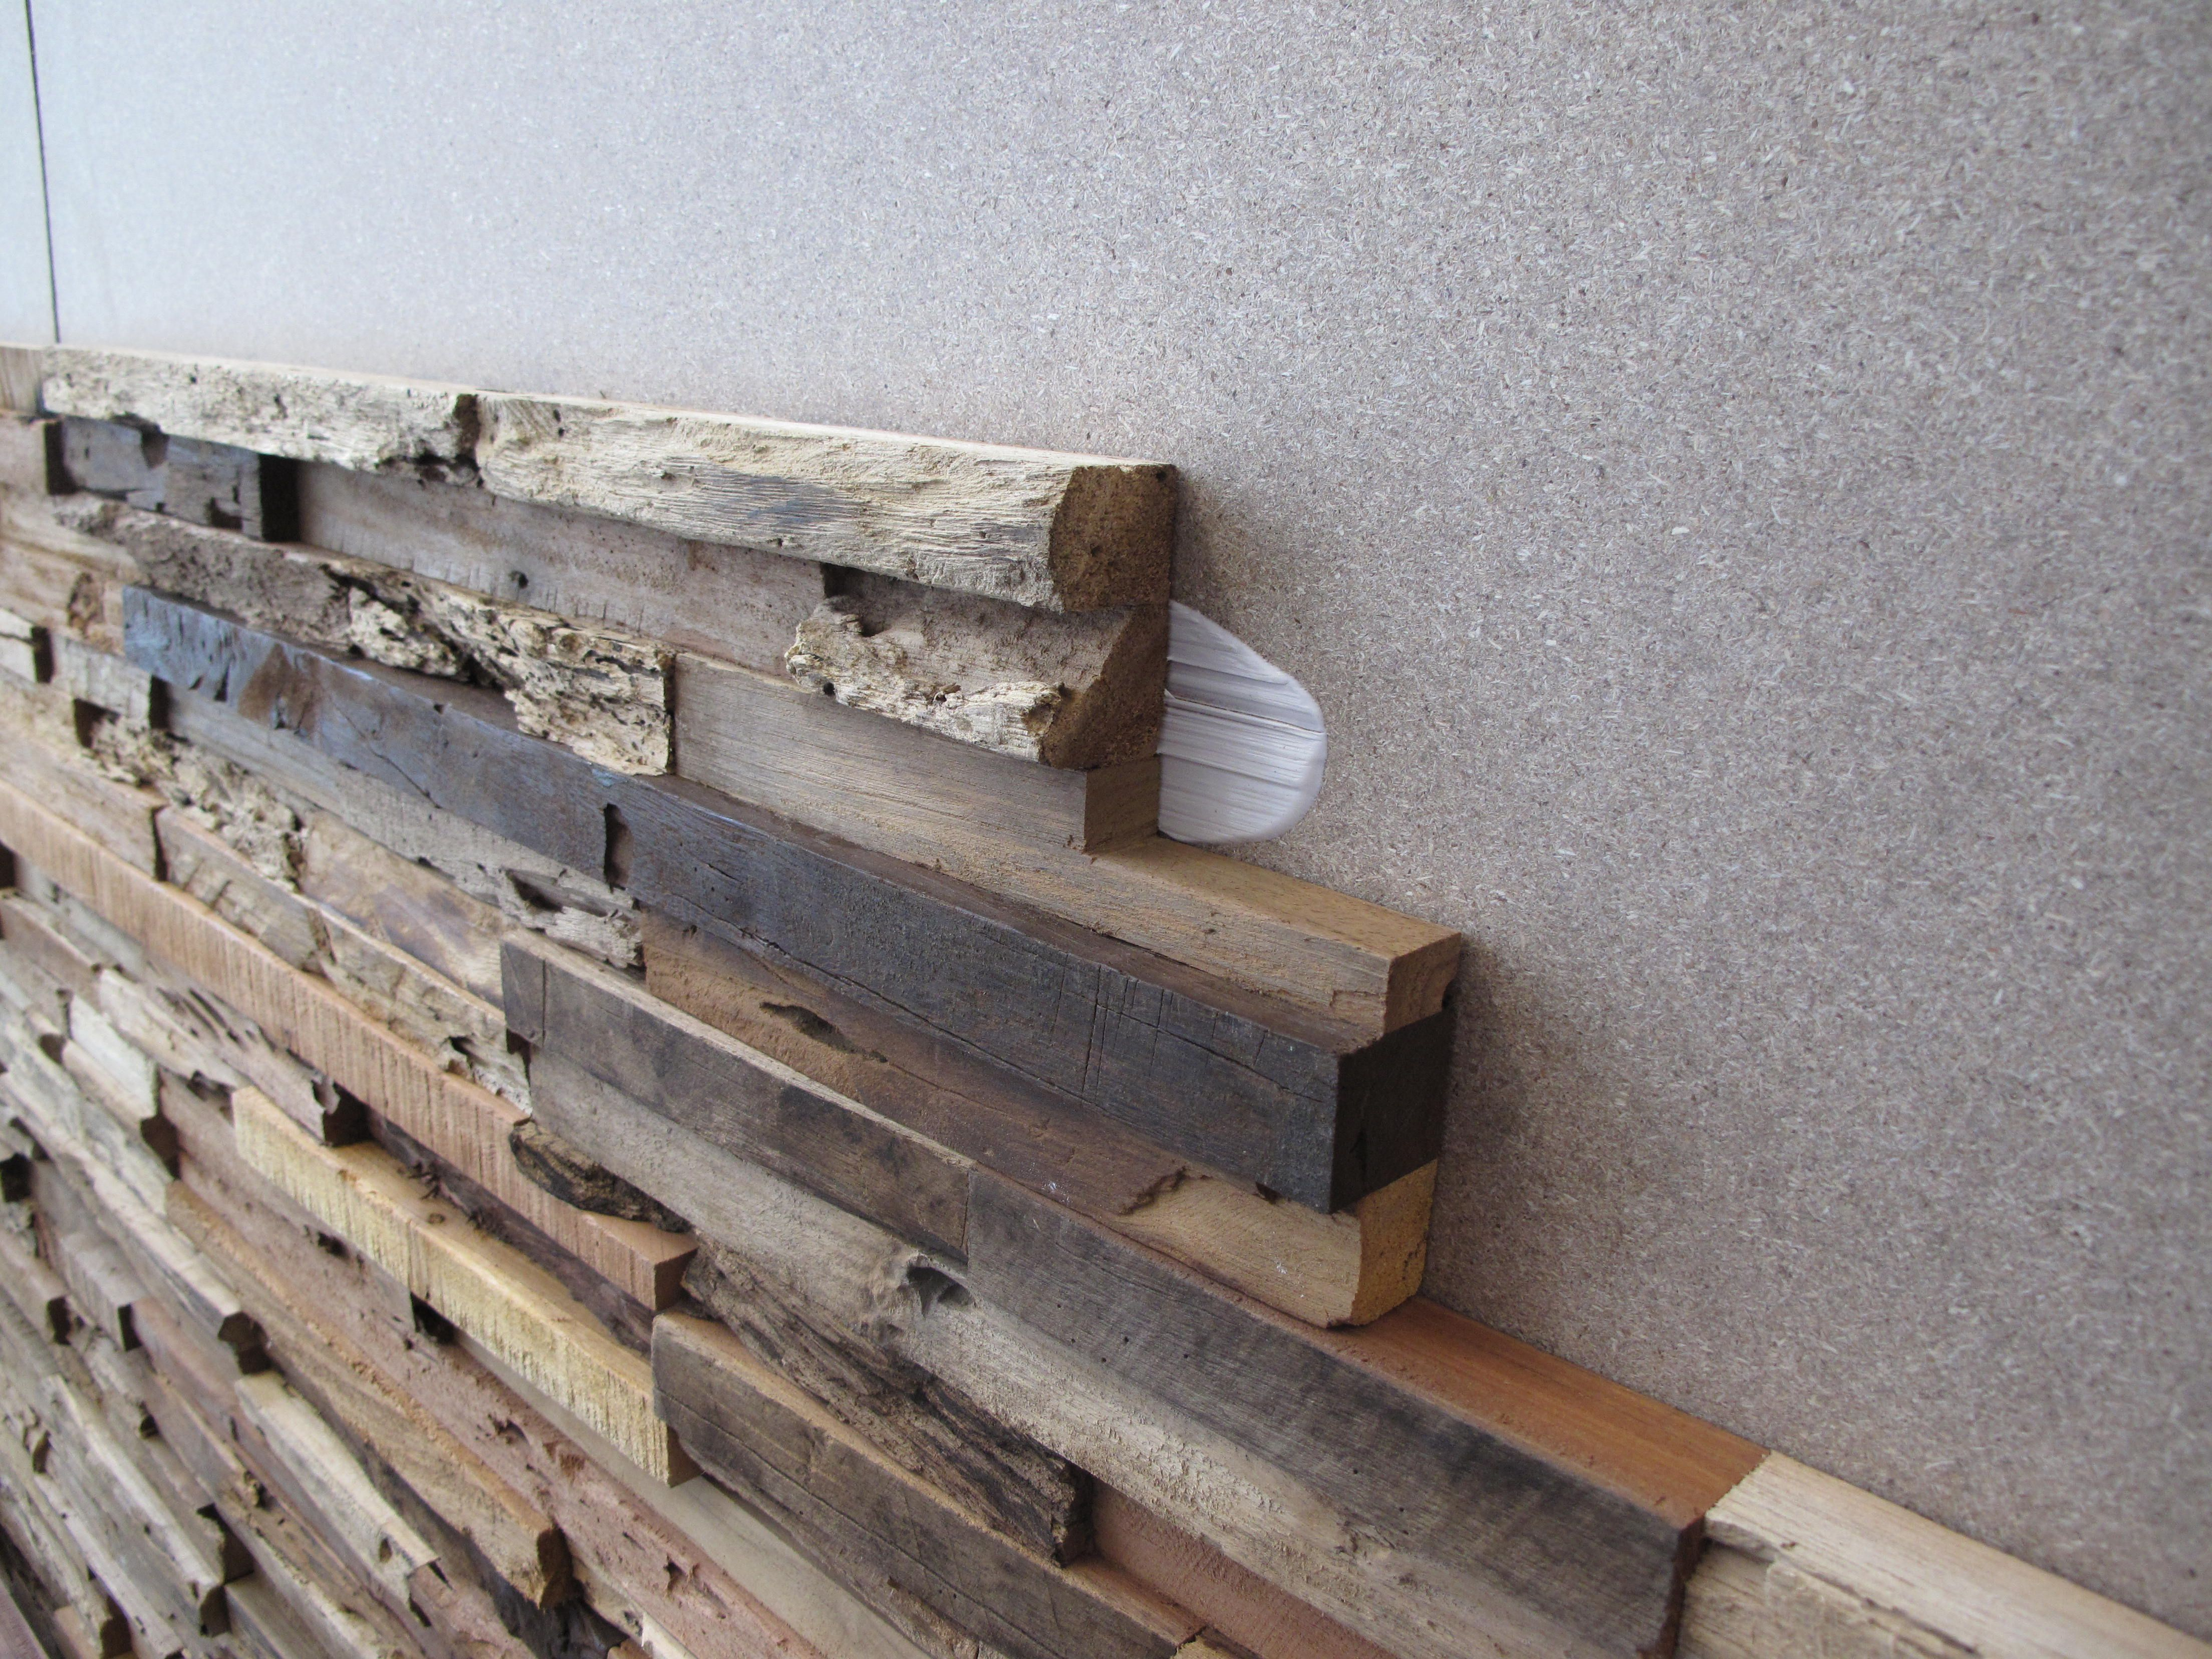 Montage Wandverkleidung Paneel Wandverkleidung Holz Wandverkleidung Wandpaneele Holz